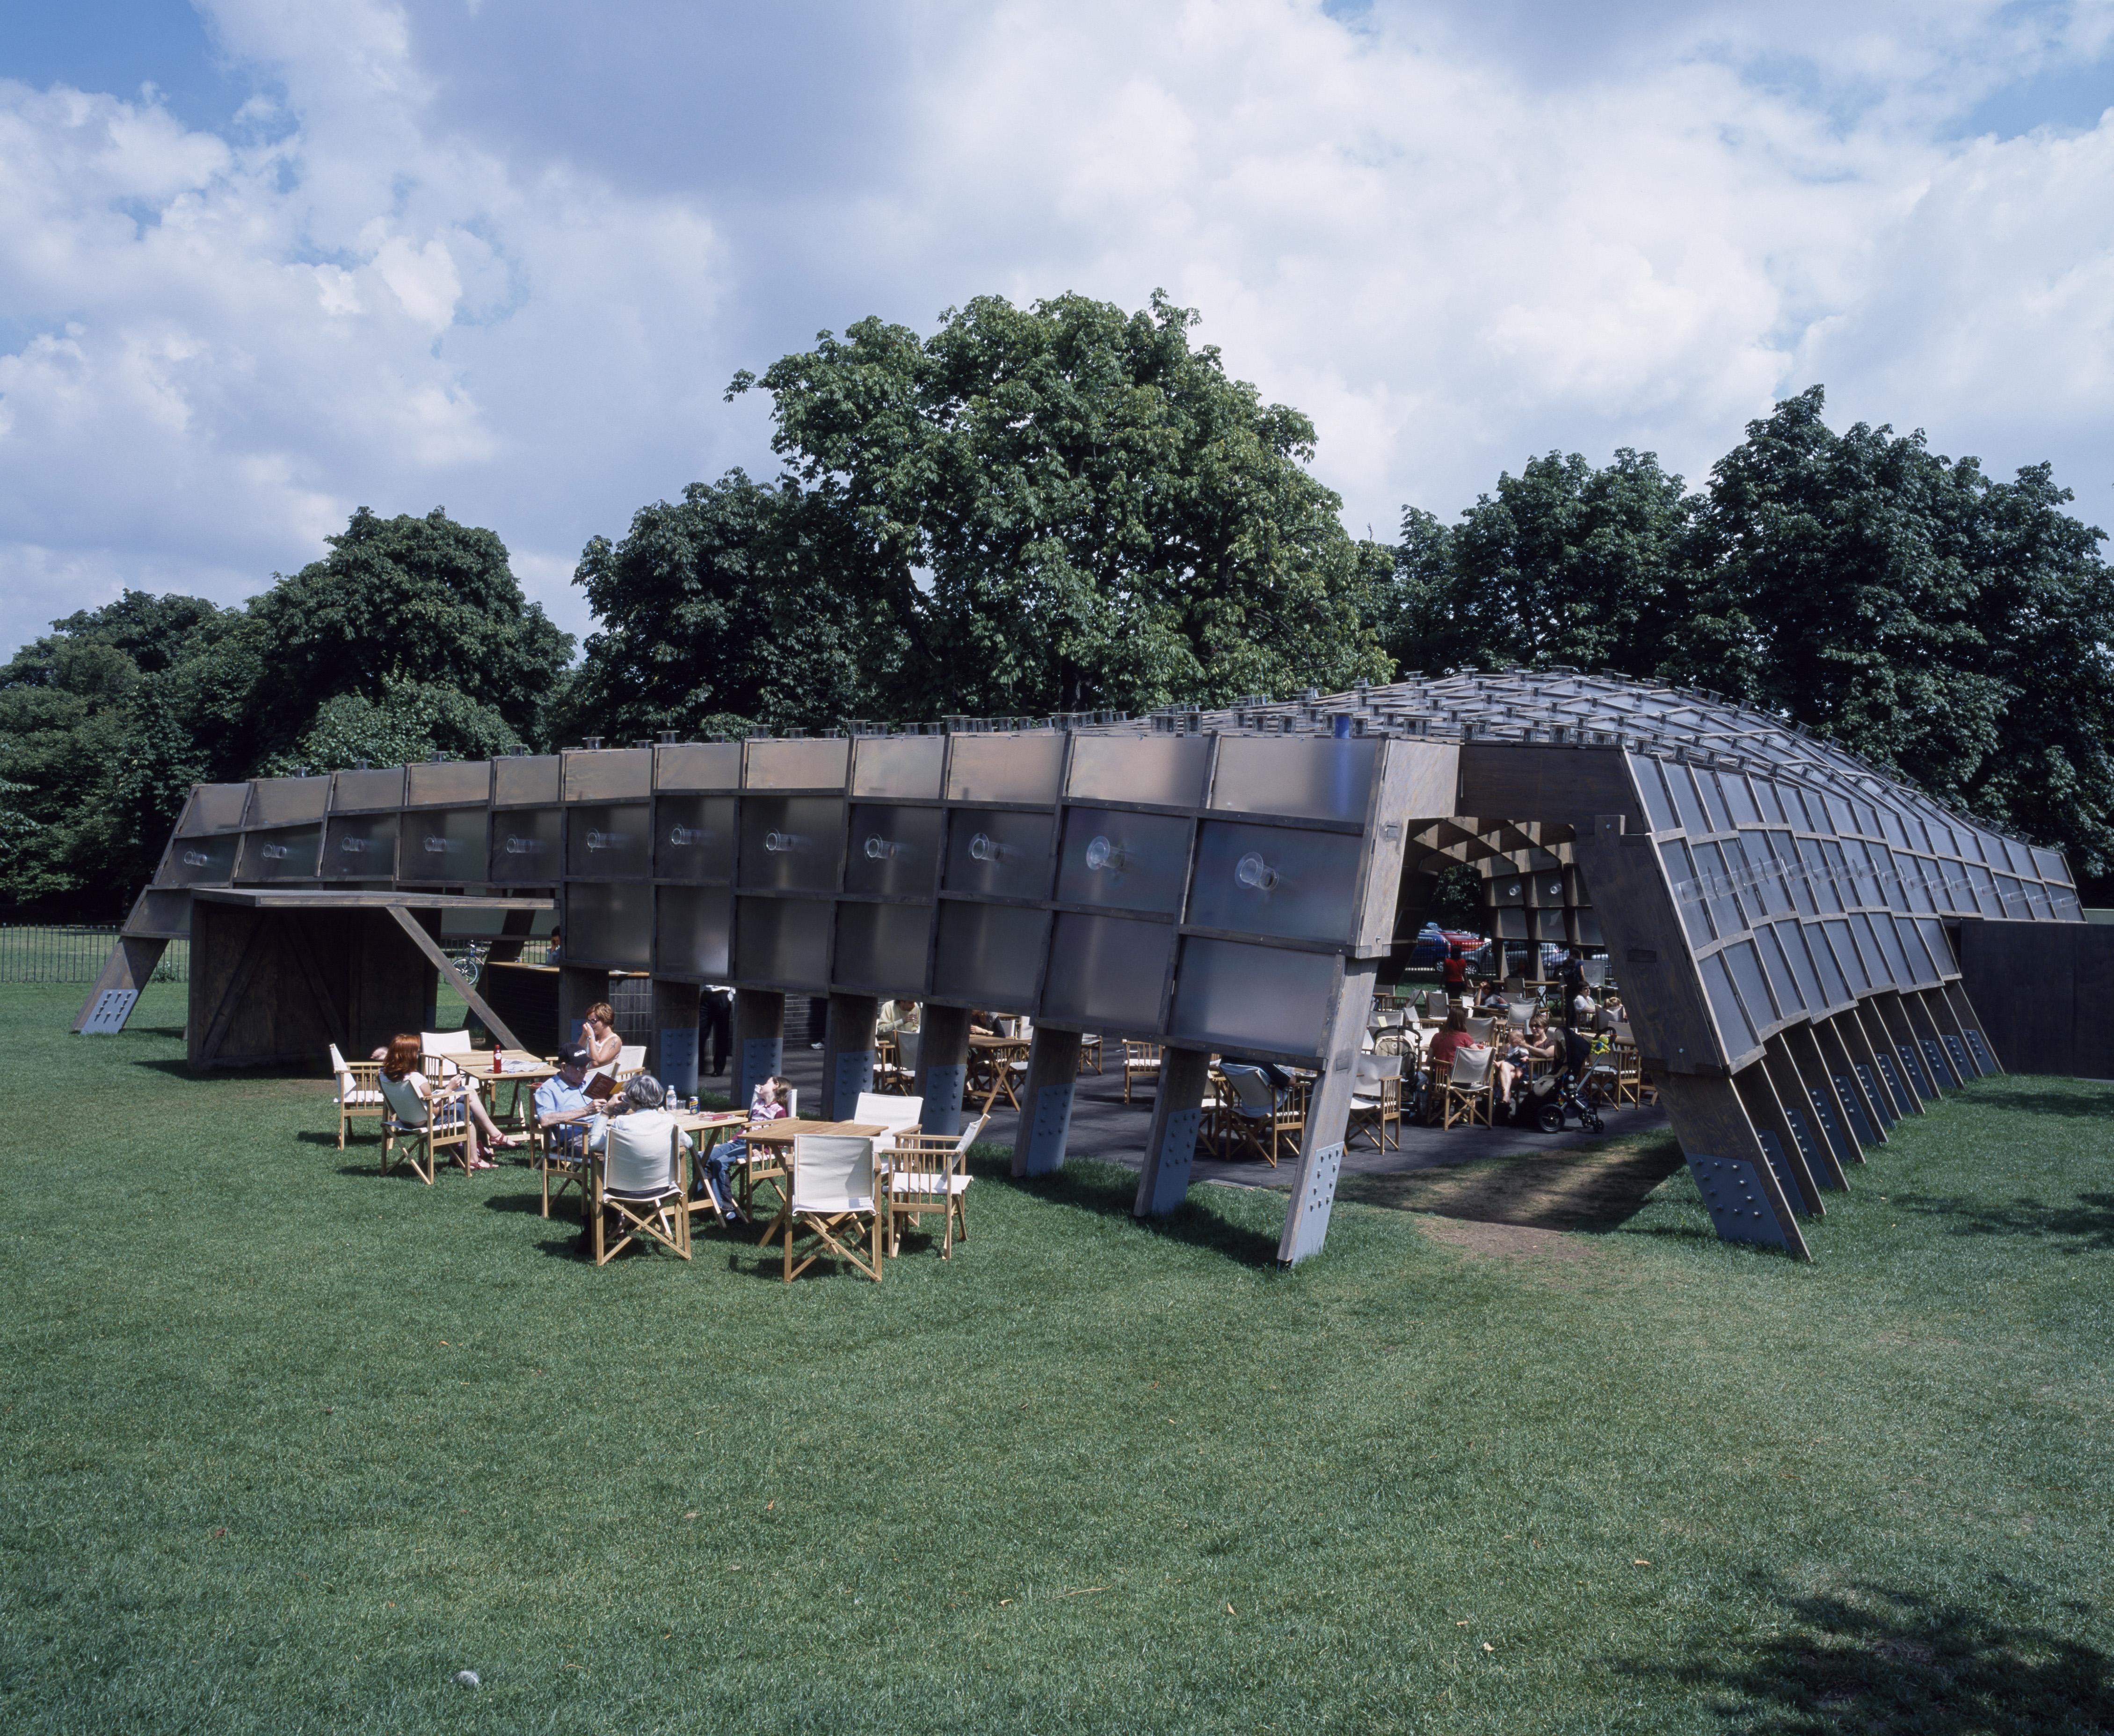 2005 Serpentine Gallery Pavilion Architect Magazine